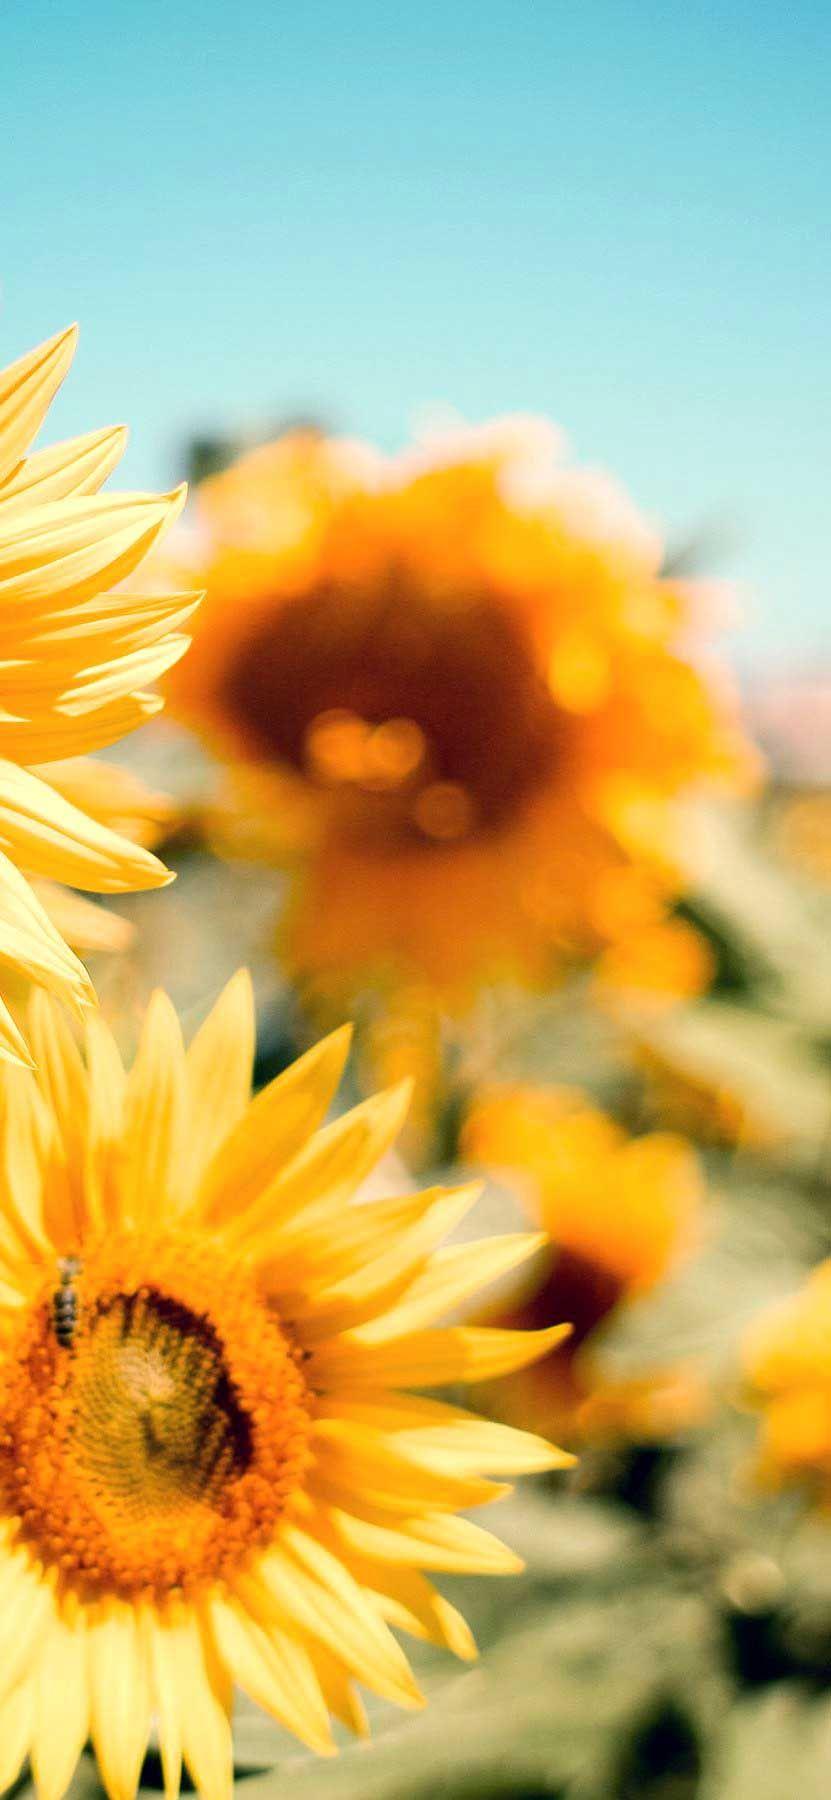 Iphone Wallpaper Golden Sunflower Desktop Wallpaper Hd In 2020 Iphone Wallpaper Best Nature Wallpapers Macbook Wallpaper